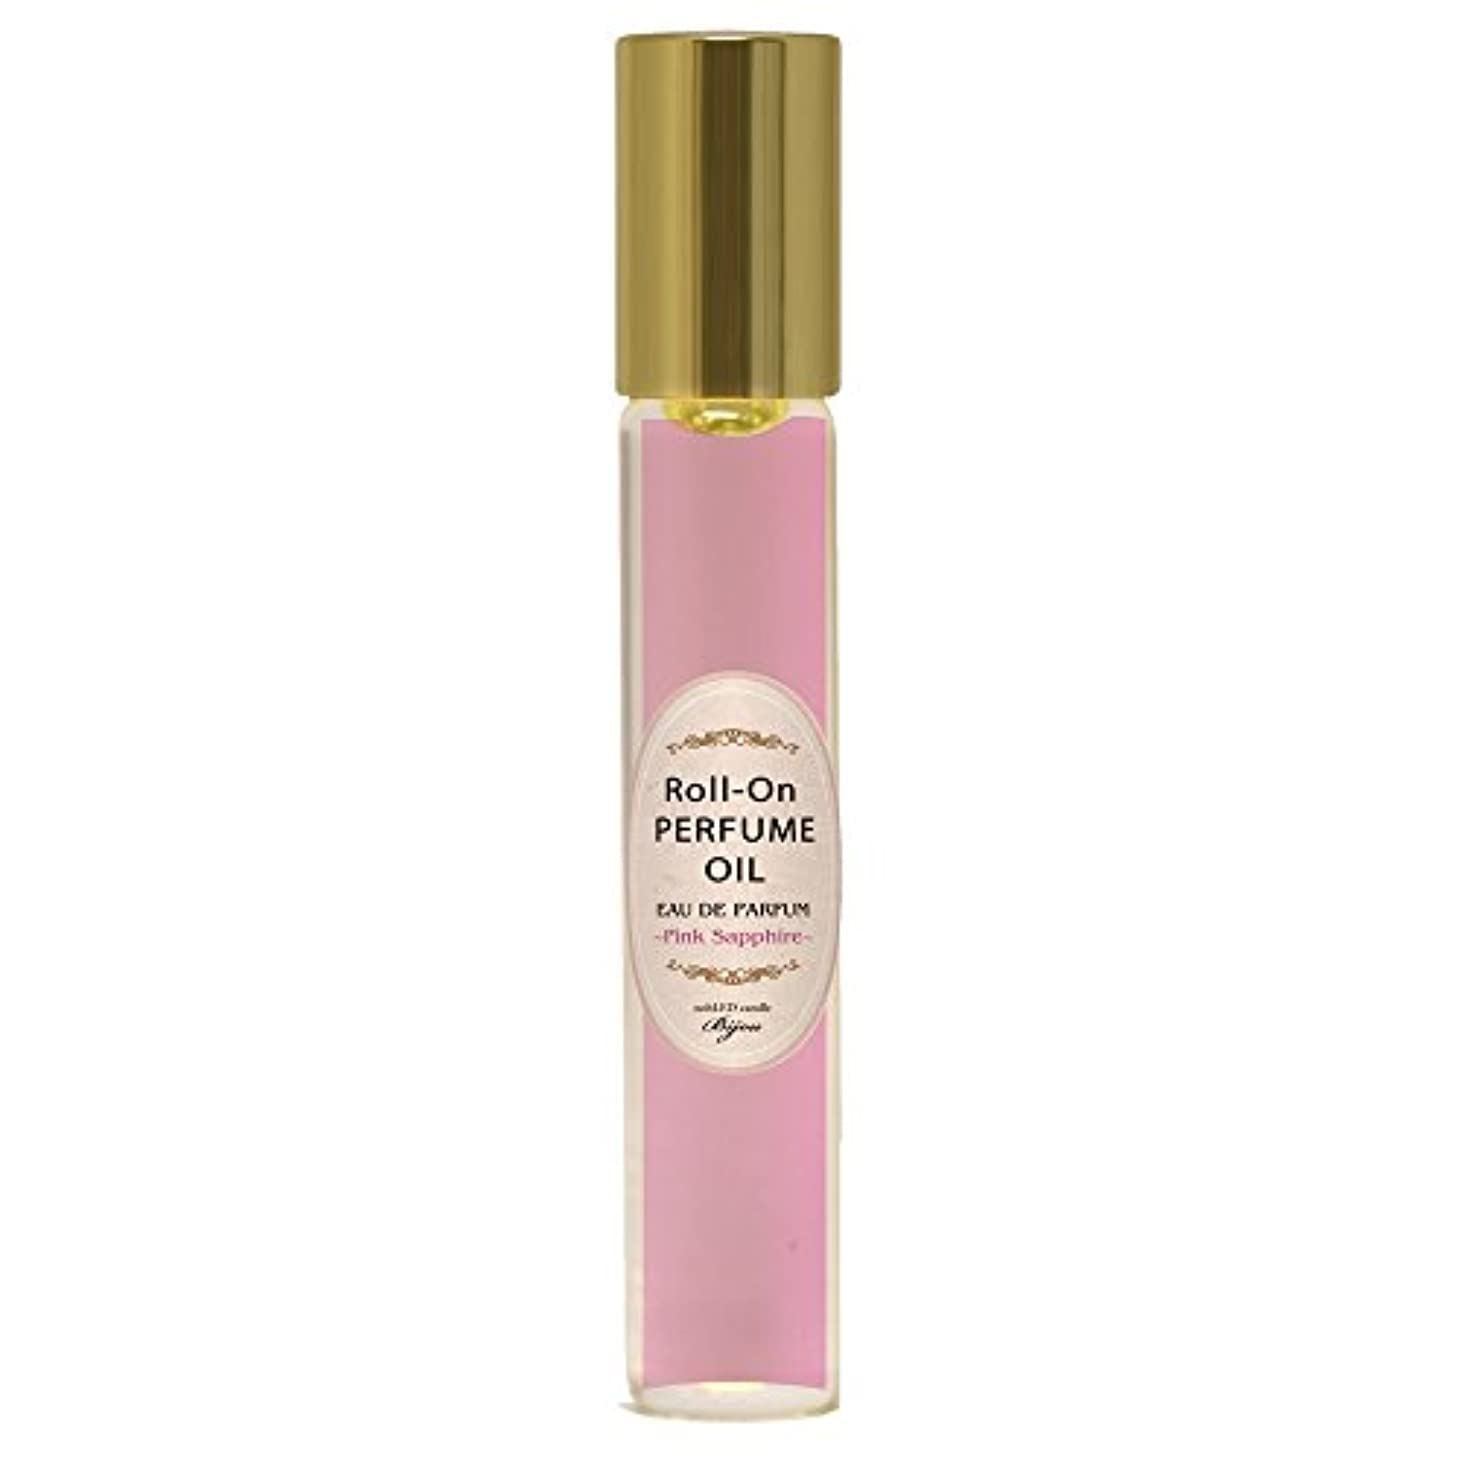 nobLED candle Bijou ロールオンパフュームオイル ピンクサファイア Pink Sapphire Roll-On PERFUME OIL ノーブレッド キャンドル ビジュー